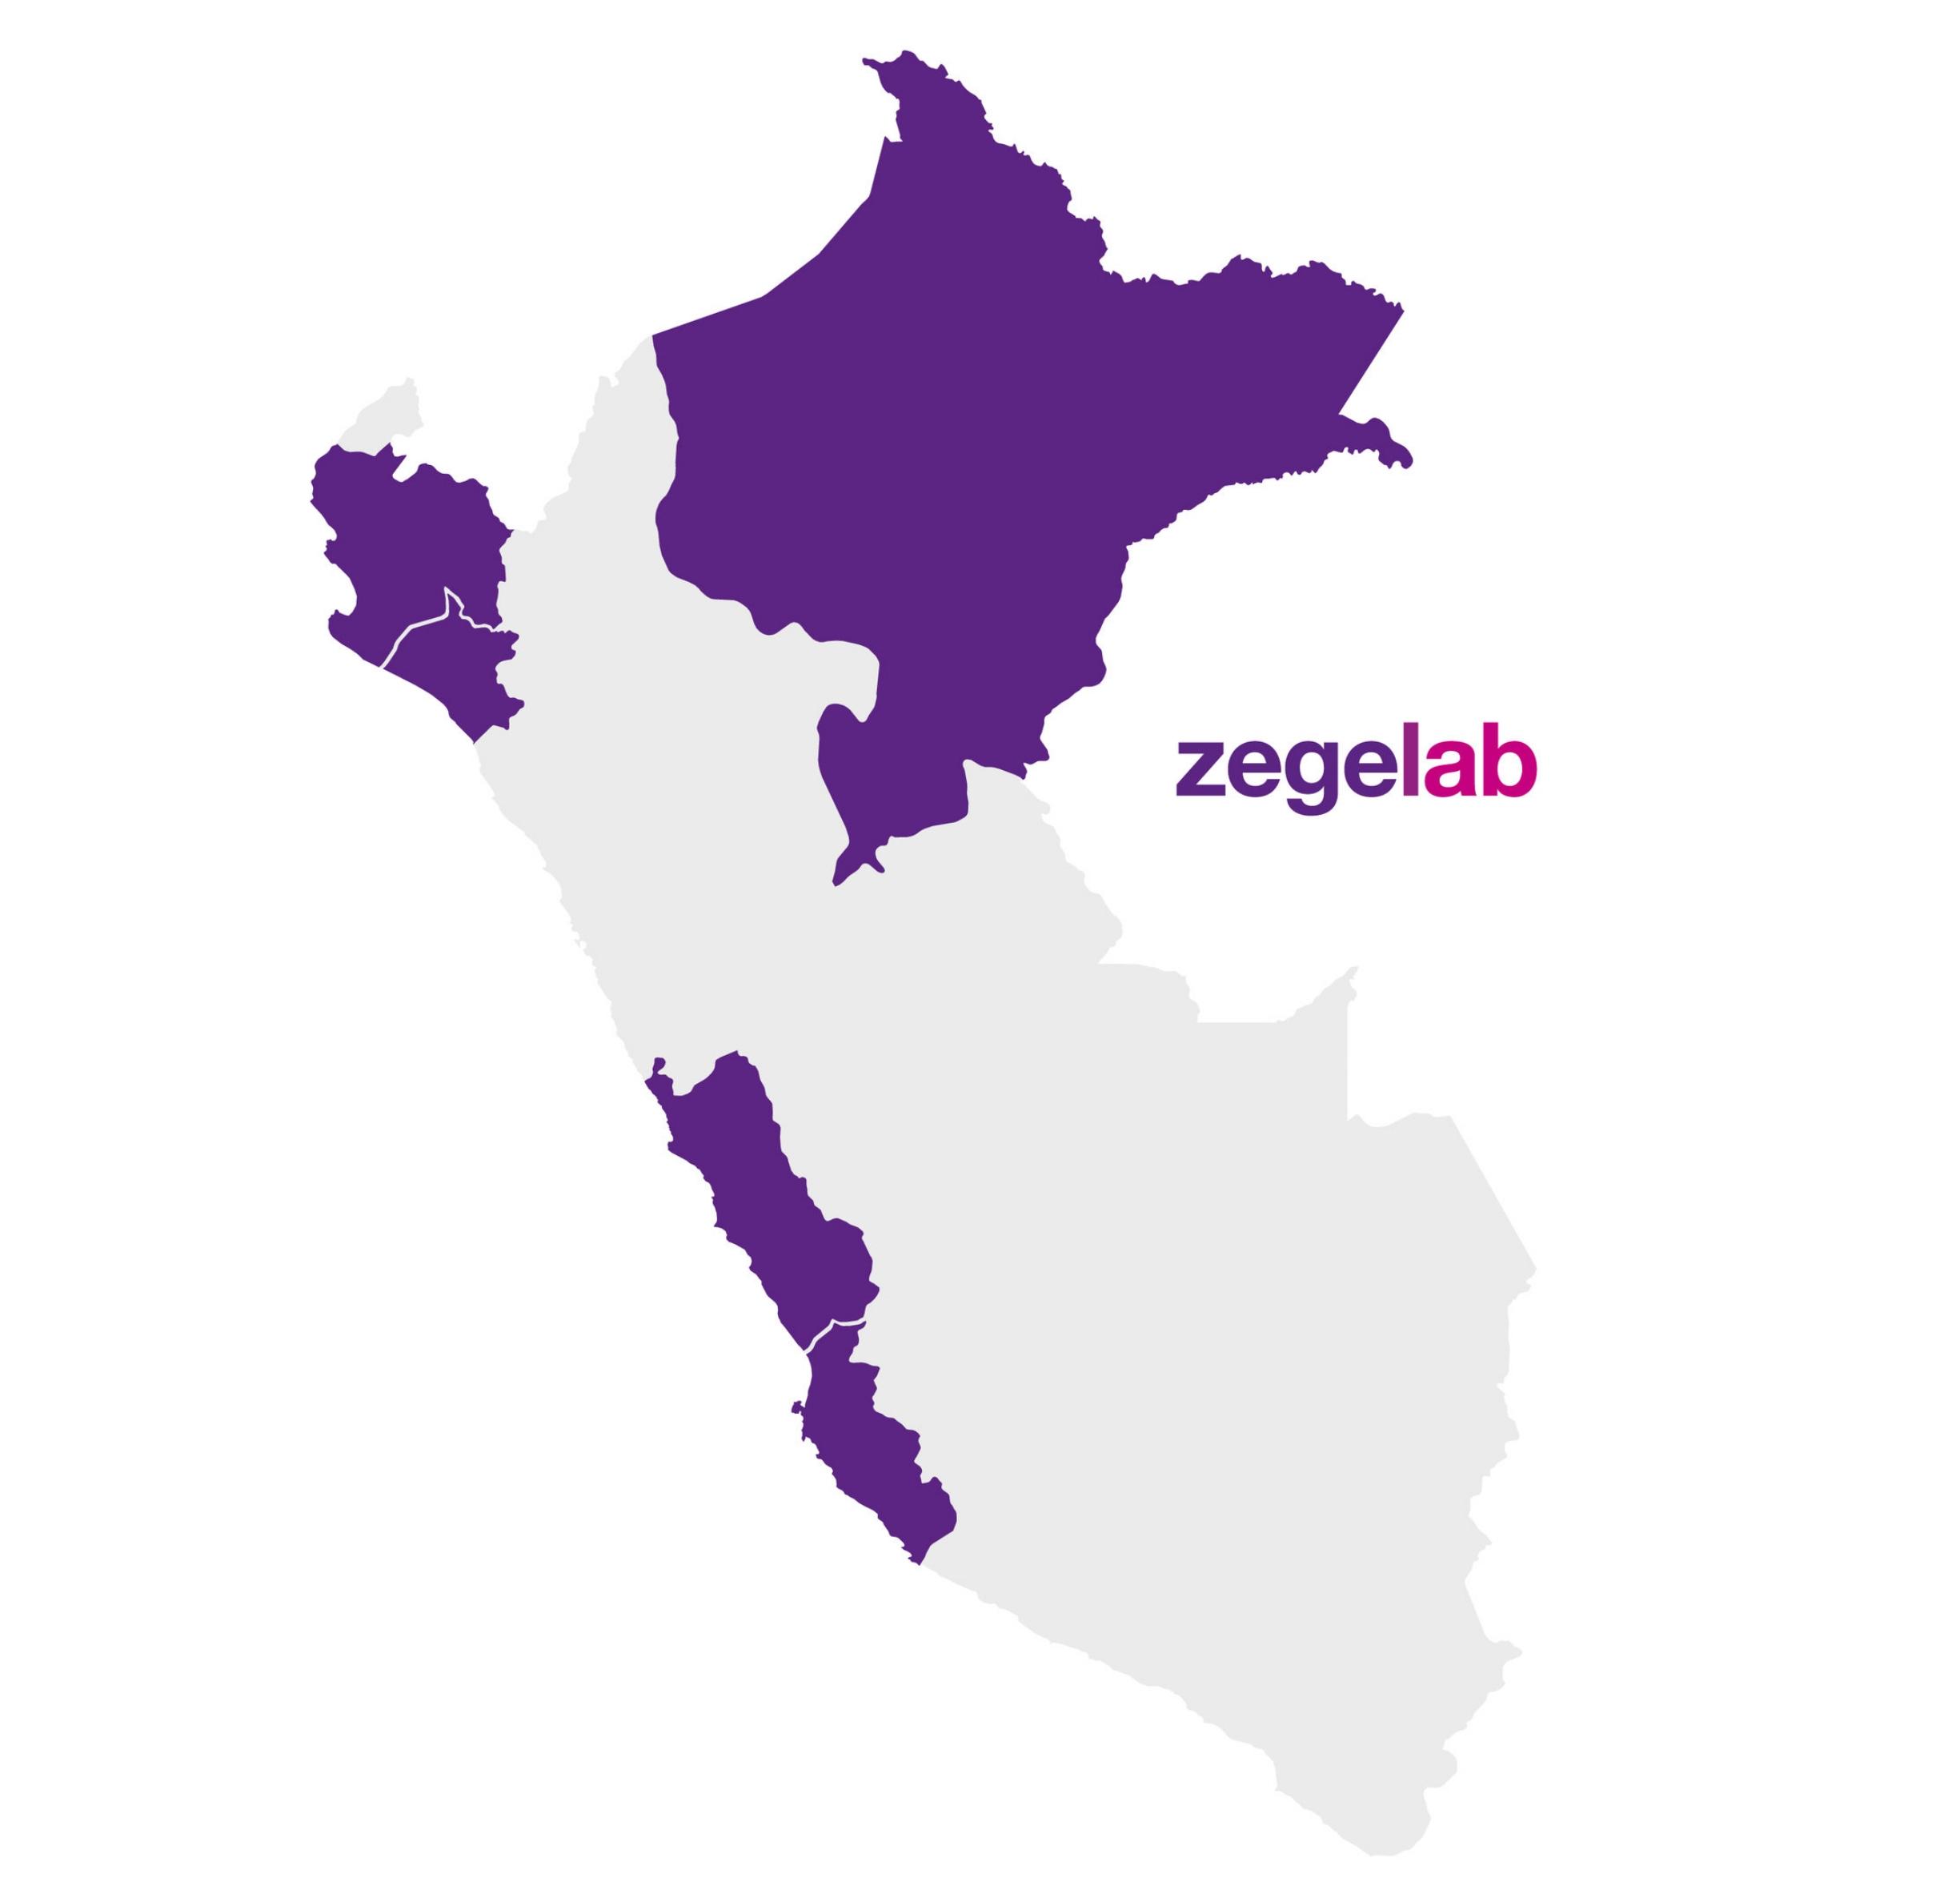 mapa zegelab-01 (2).jpg